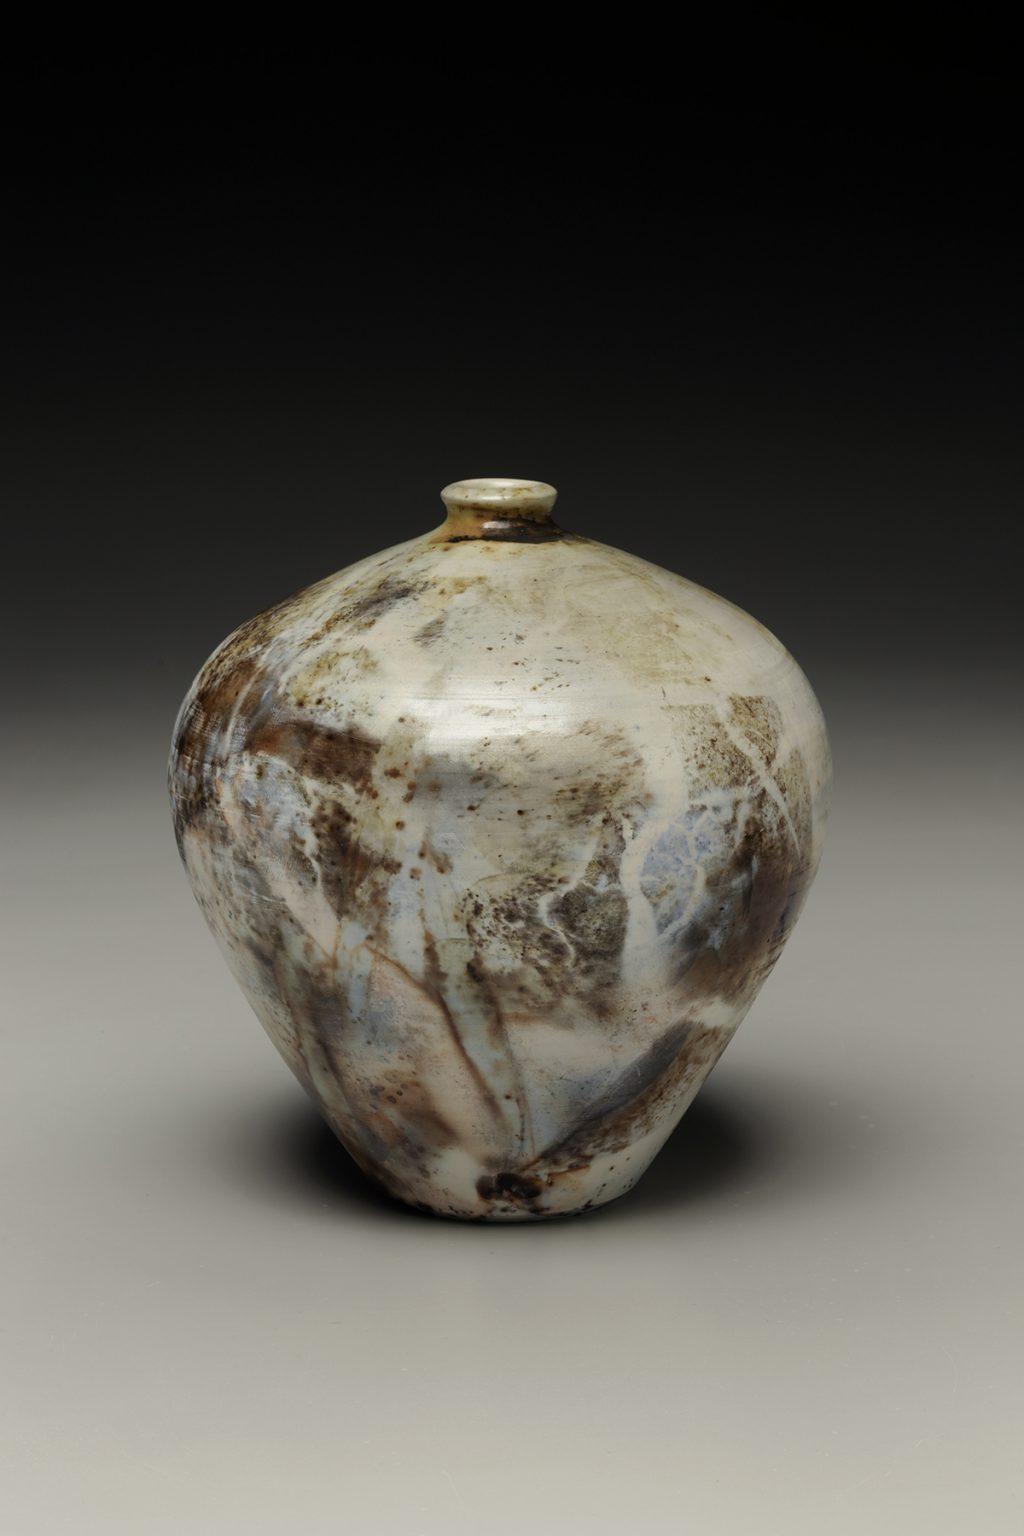 Judi Harwood, The Village Potters Clay Center, Asheville, NC, Saggar, Raku